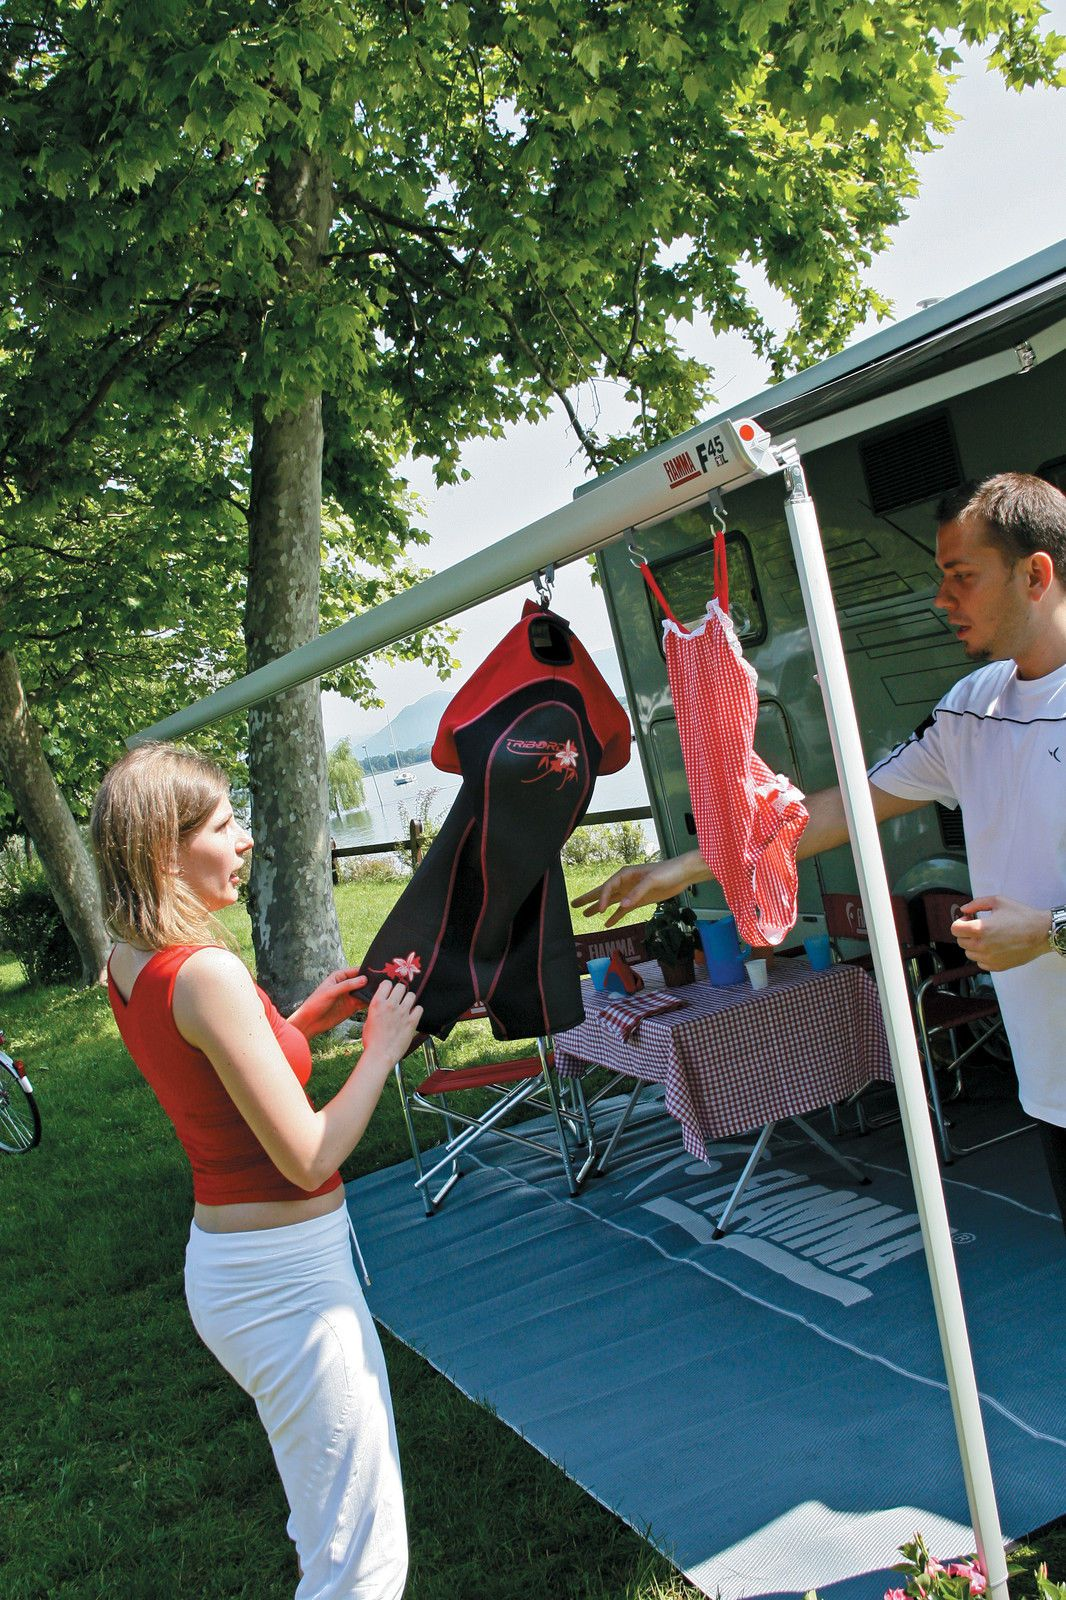 Fiamma 98655-743 Kit Awning Hangers Canopy S Hook Set of 6 for Motorhome Caravan